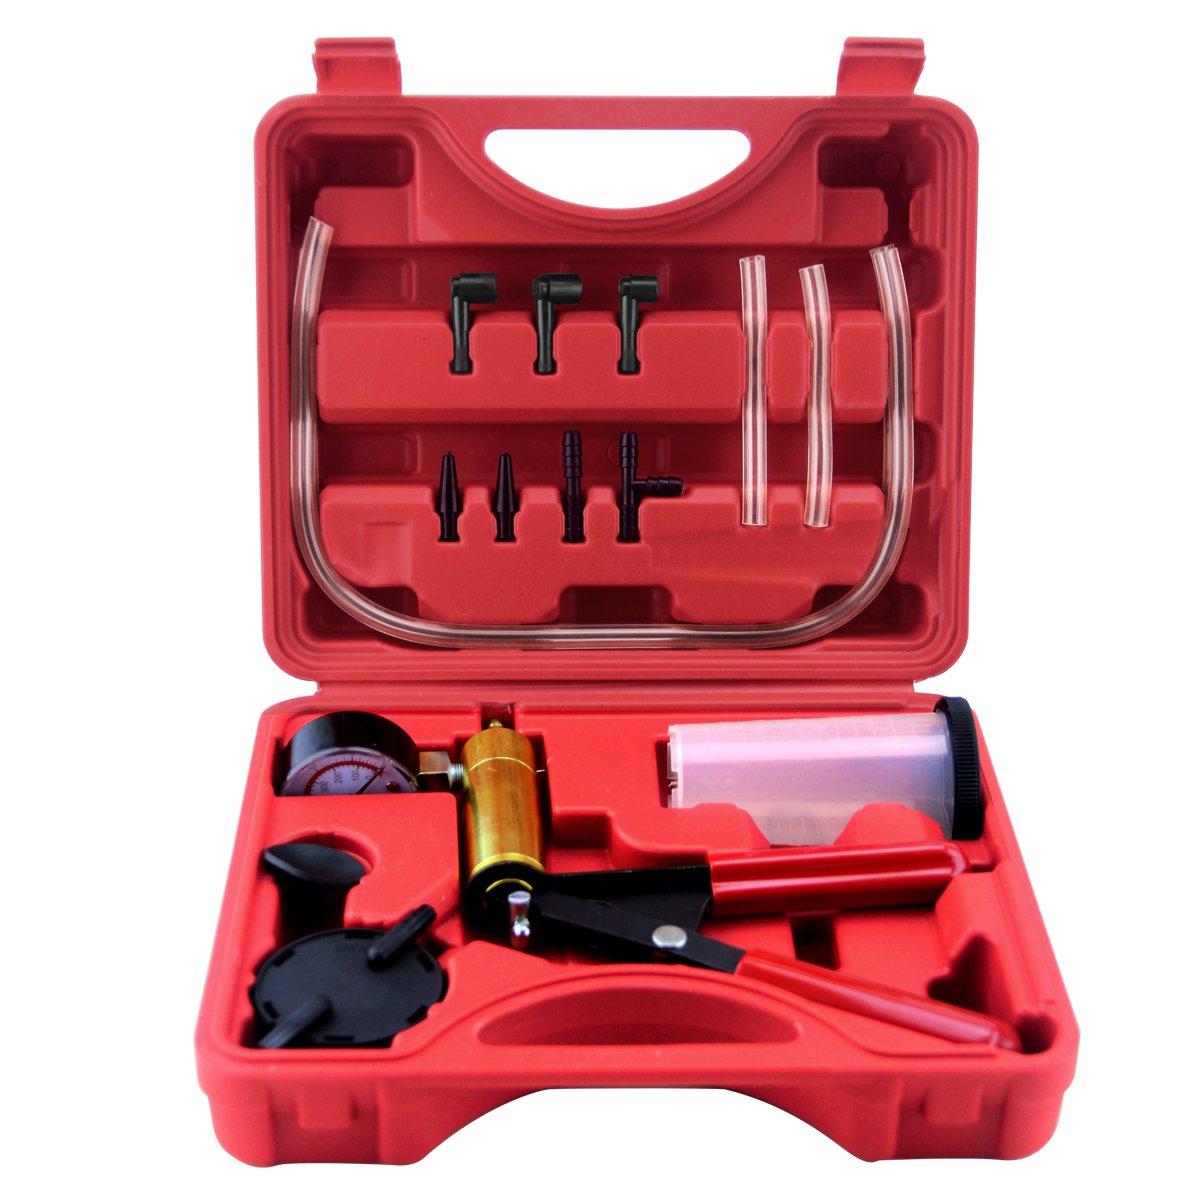 QSICISL Hand Held Vacuum Pump Brake Pump Tester Set Vacuum Gauge and Brake Bleeder Kit for Automotive with Adapters Case Metal handle